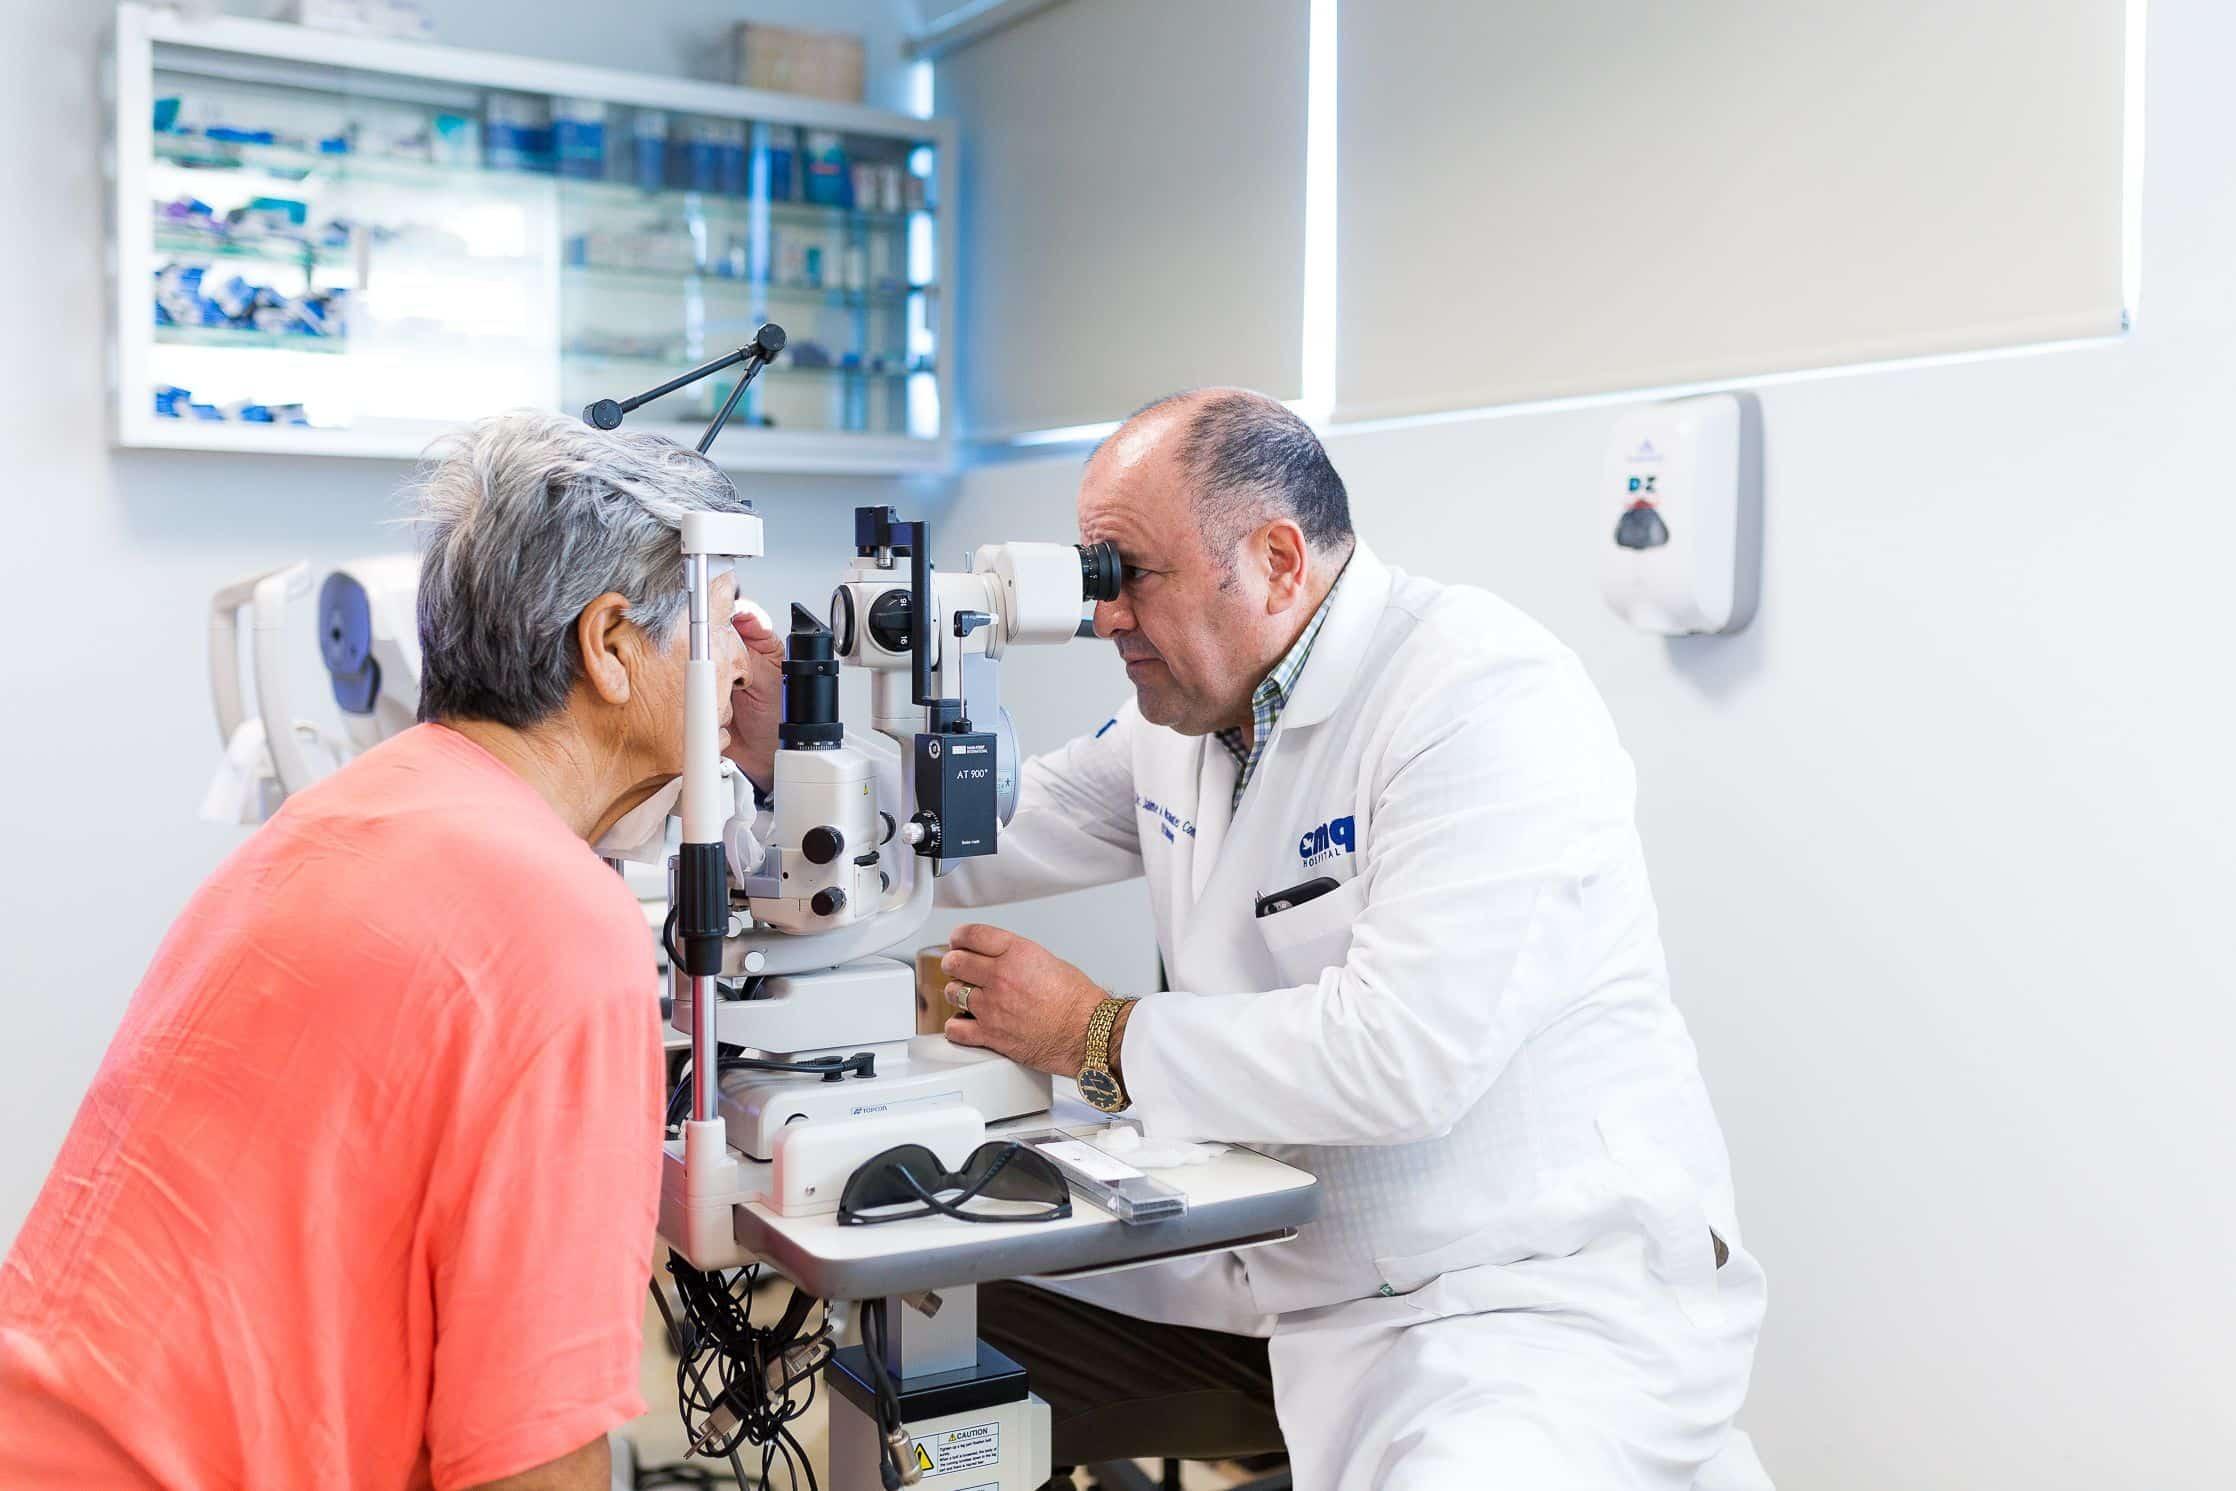 Dr. Jaime Aniceto Miramontes